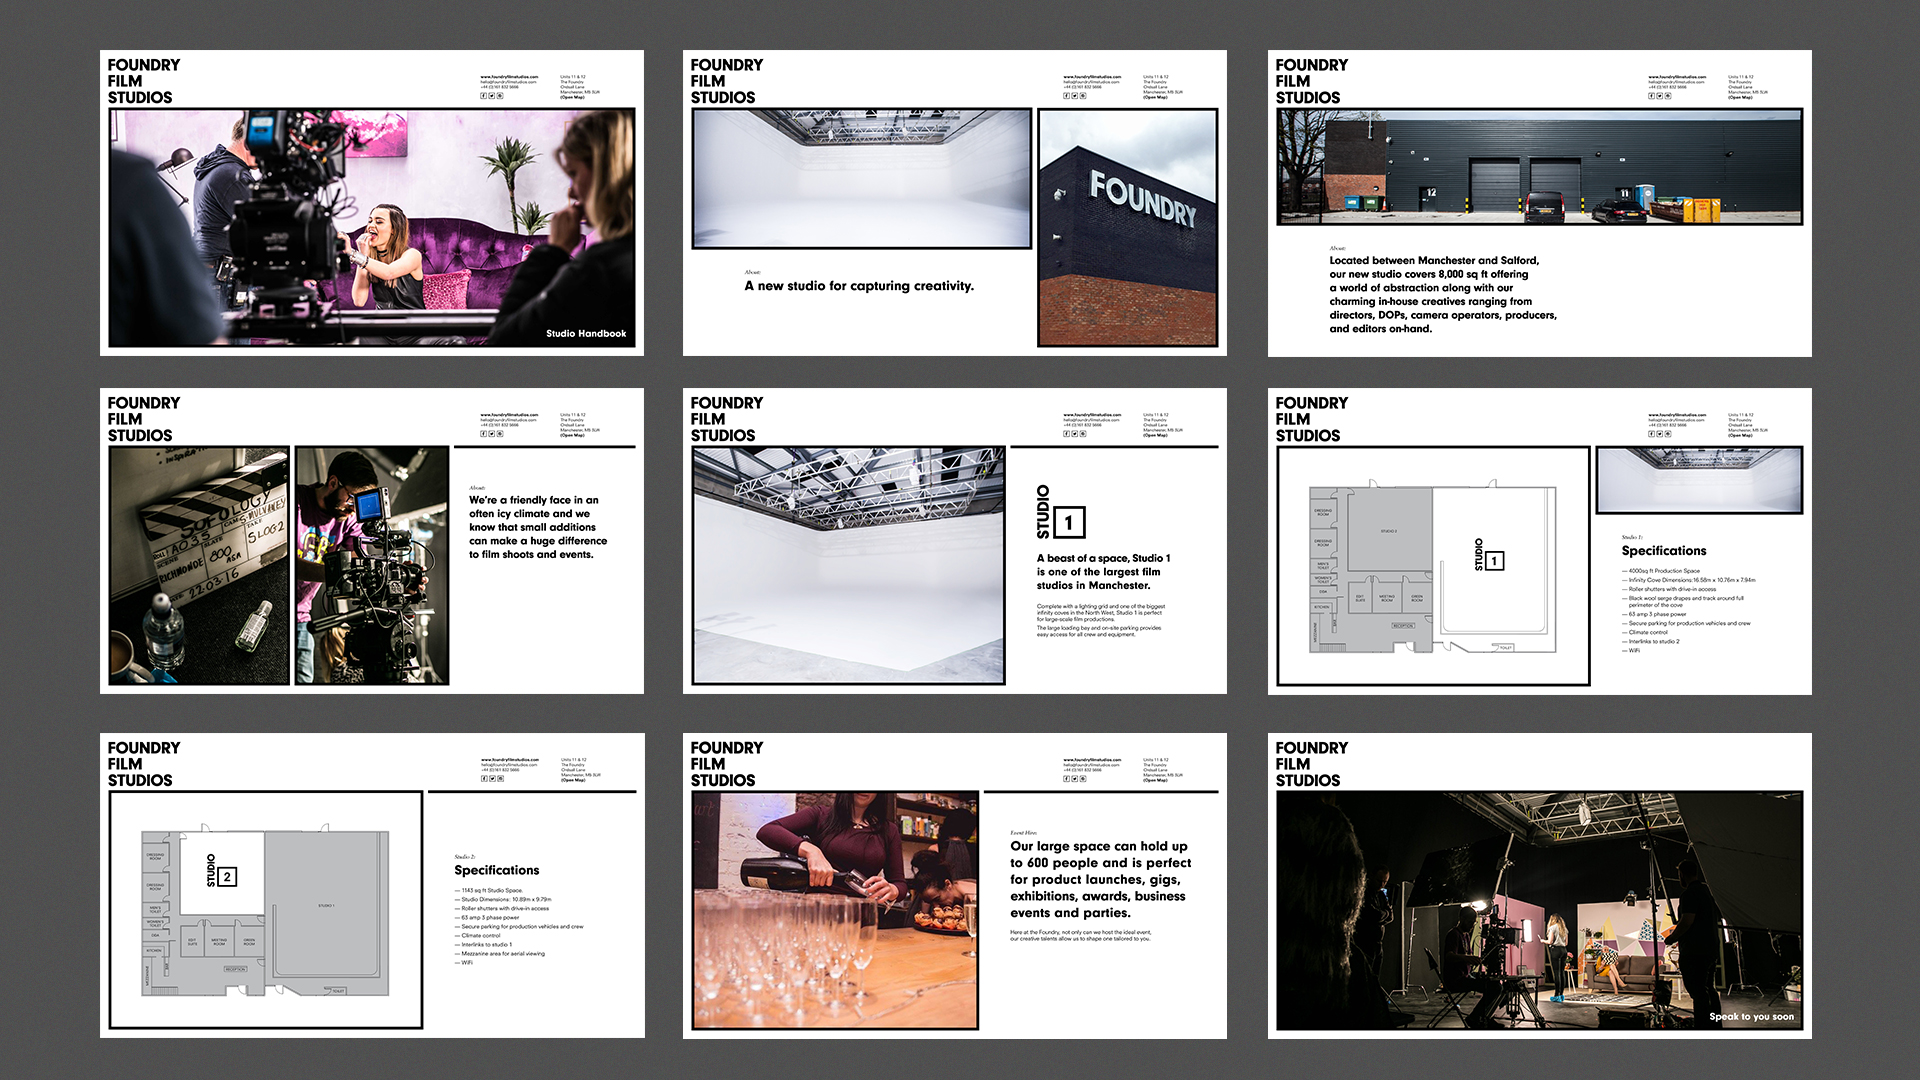 FoundryFilmStudios-Handbook-Spreads